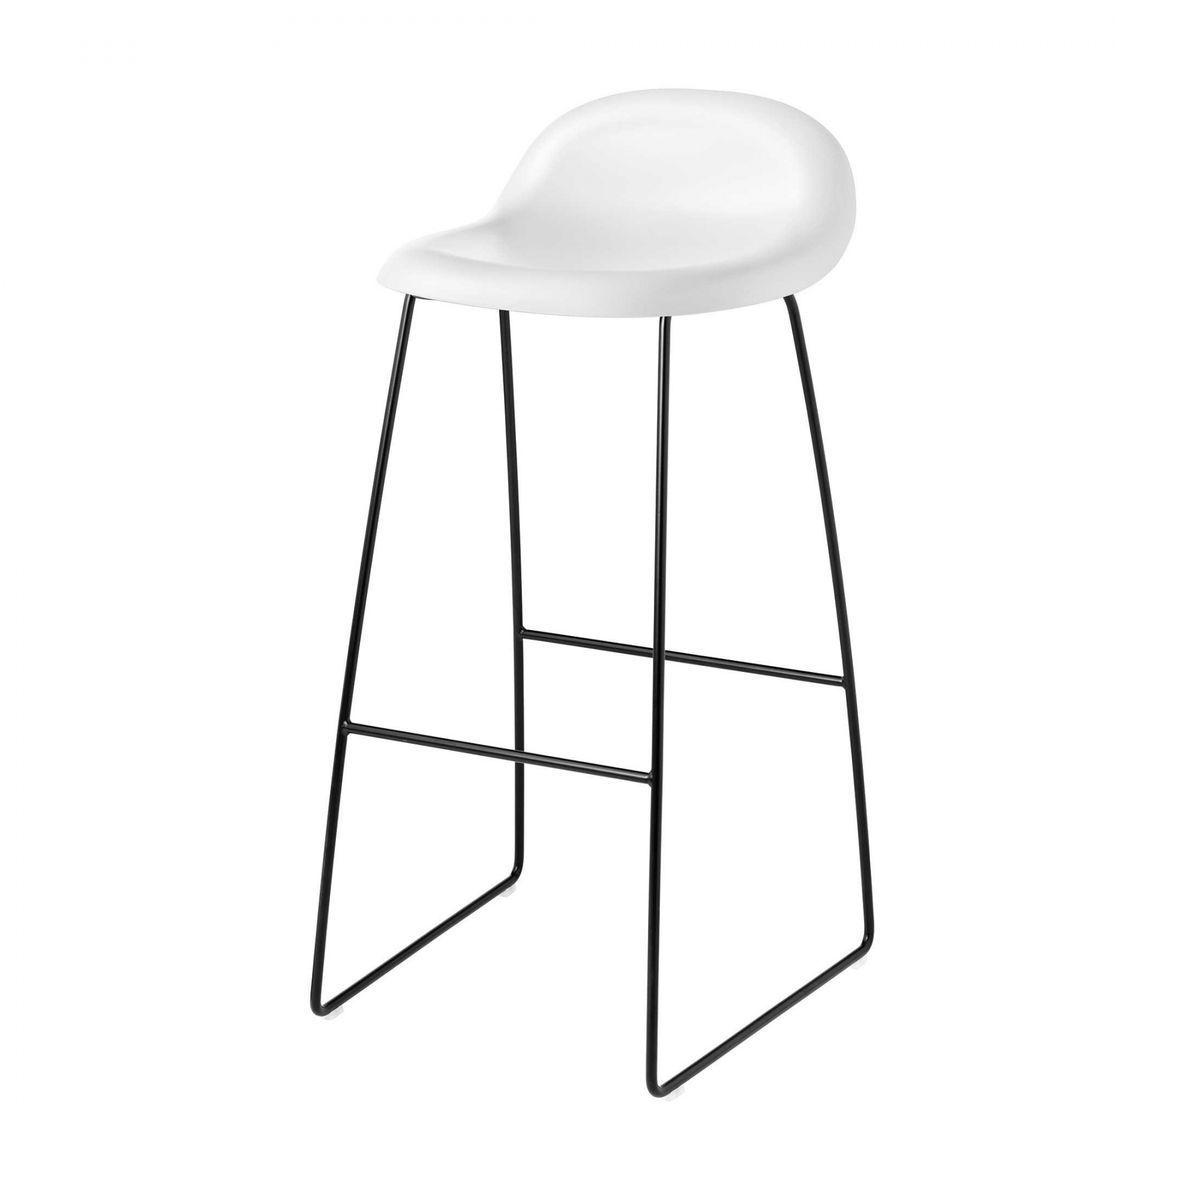 Gubi 3d bar stool kufengestell schwarz gubi black for Barhocker 3d